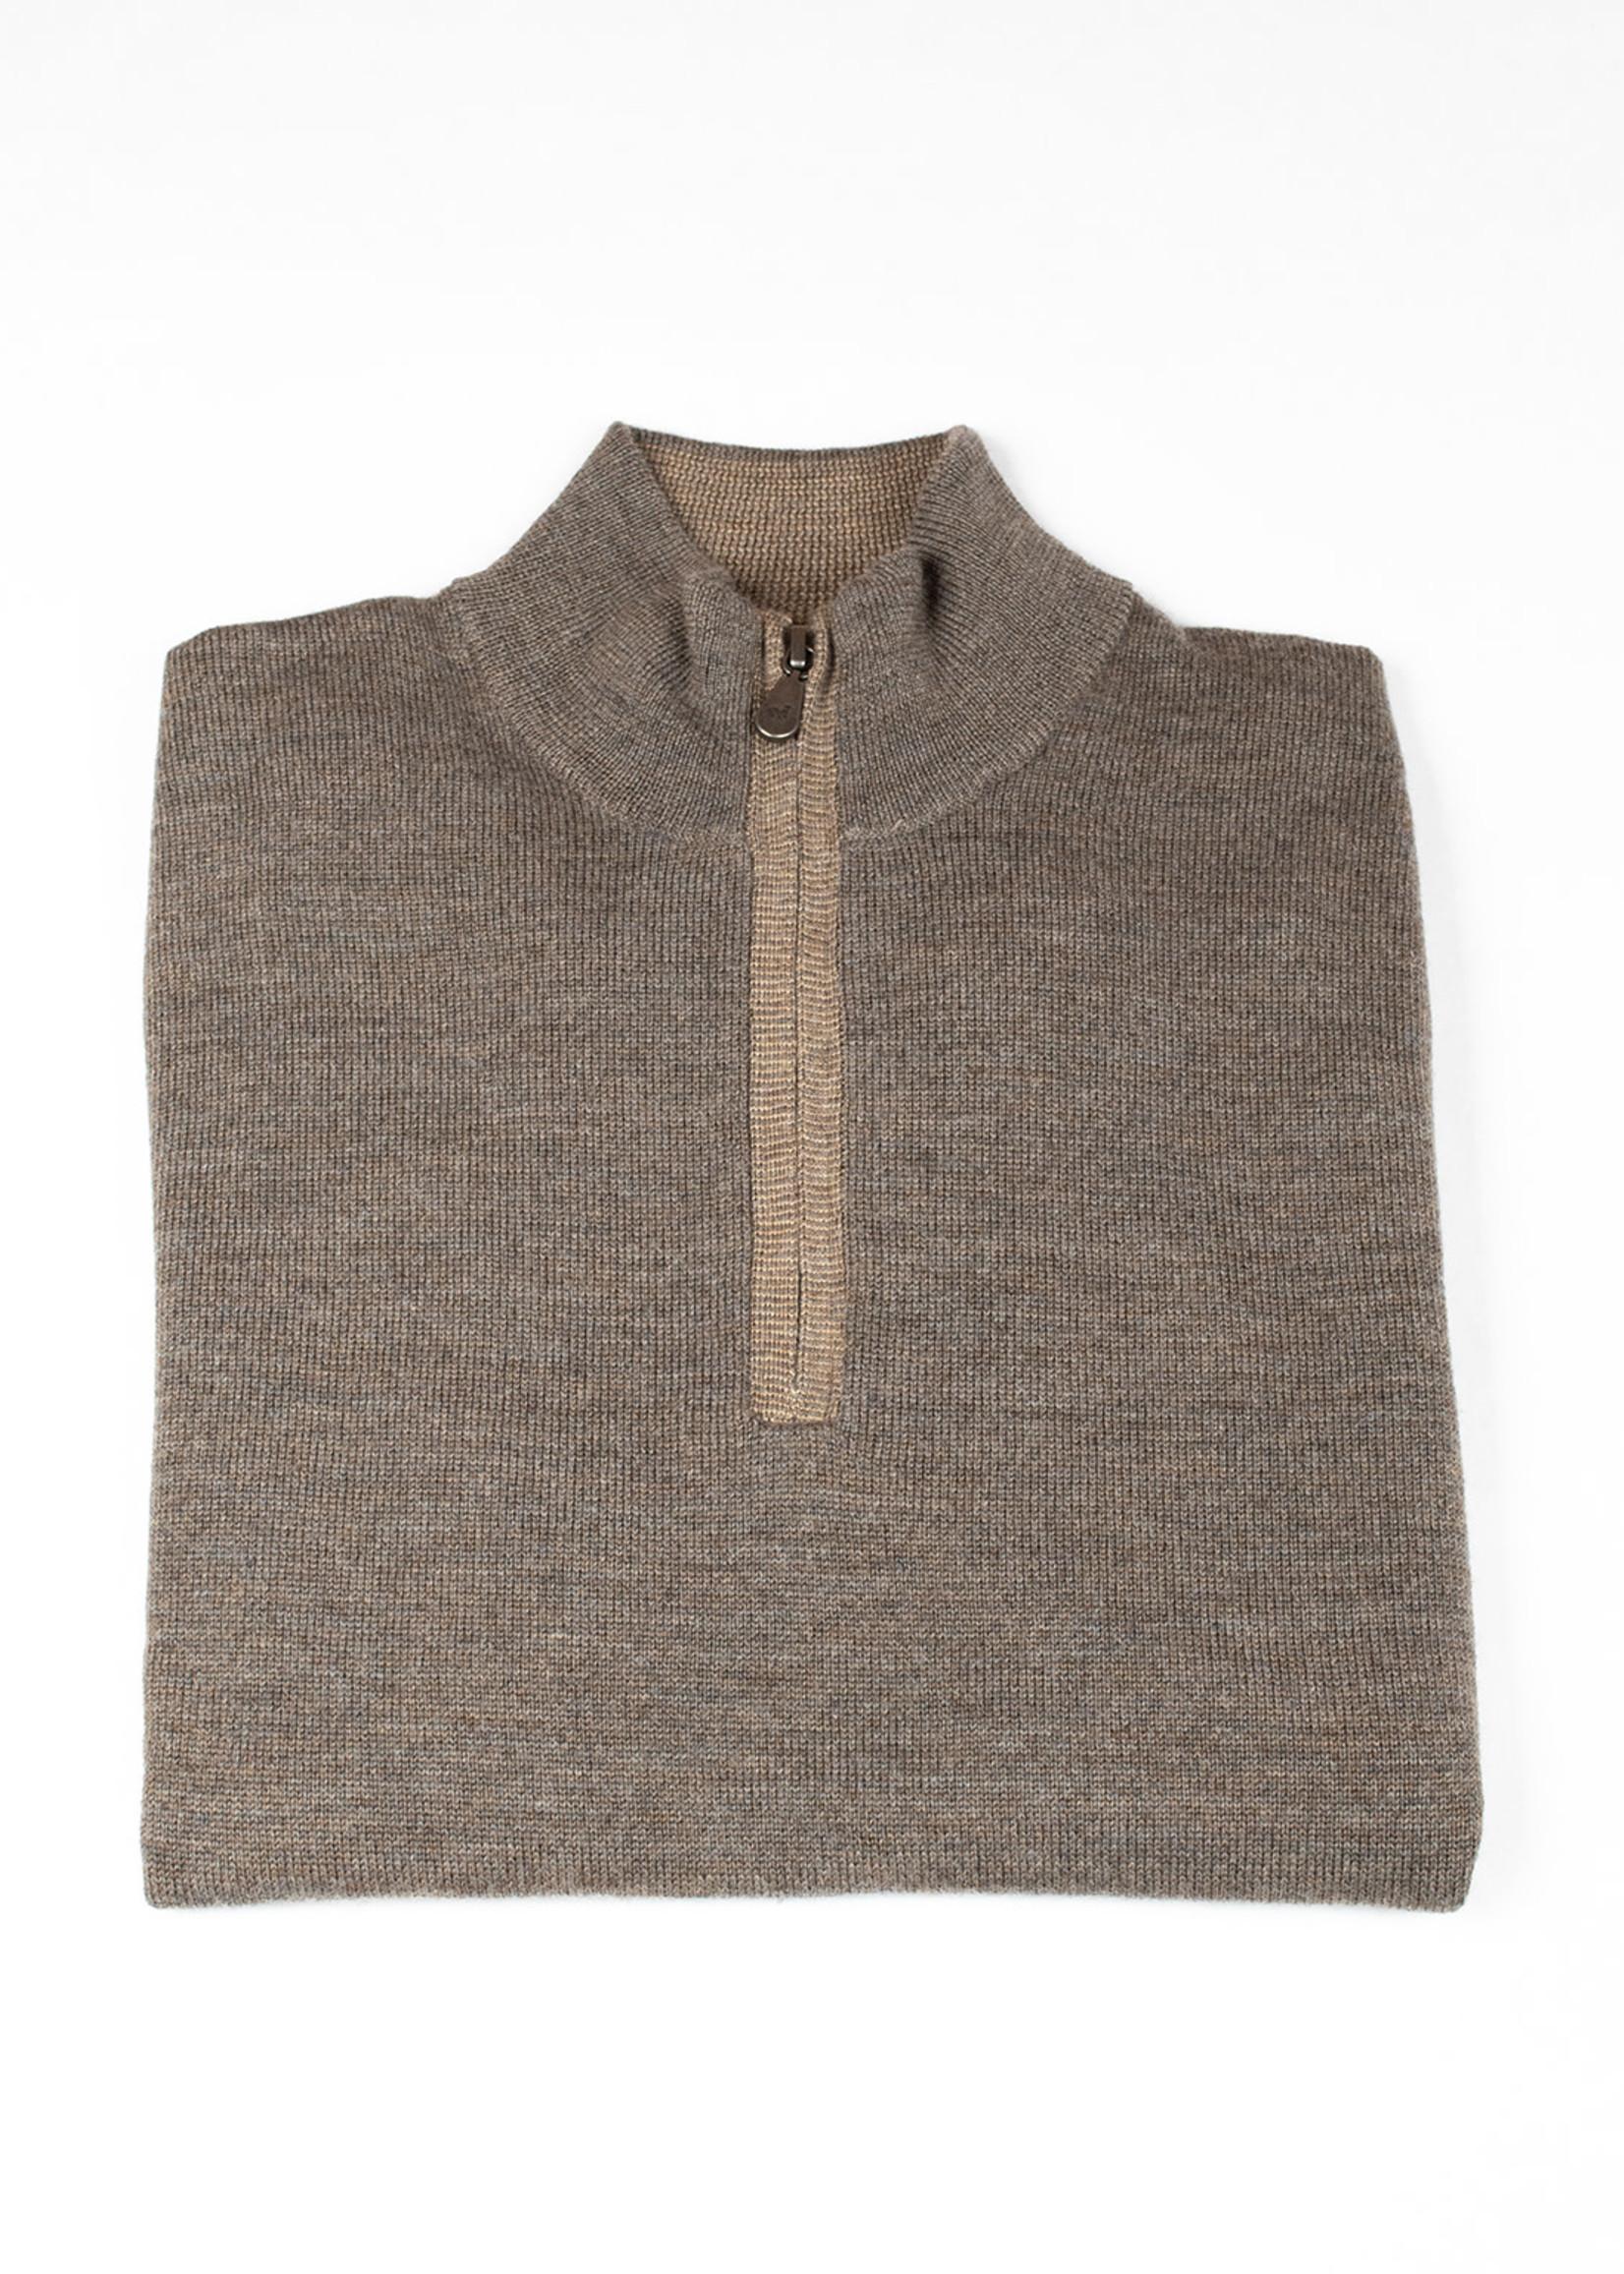 Raffi Taupe Merino Wool 1/4 Zip by Raffi